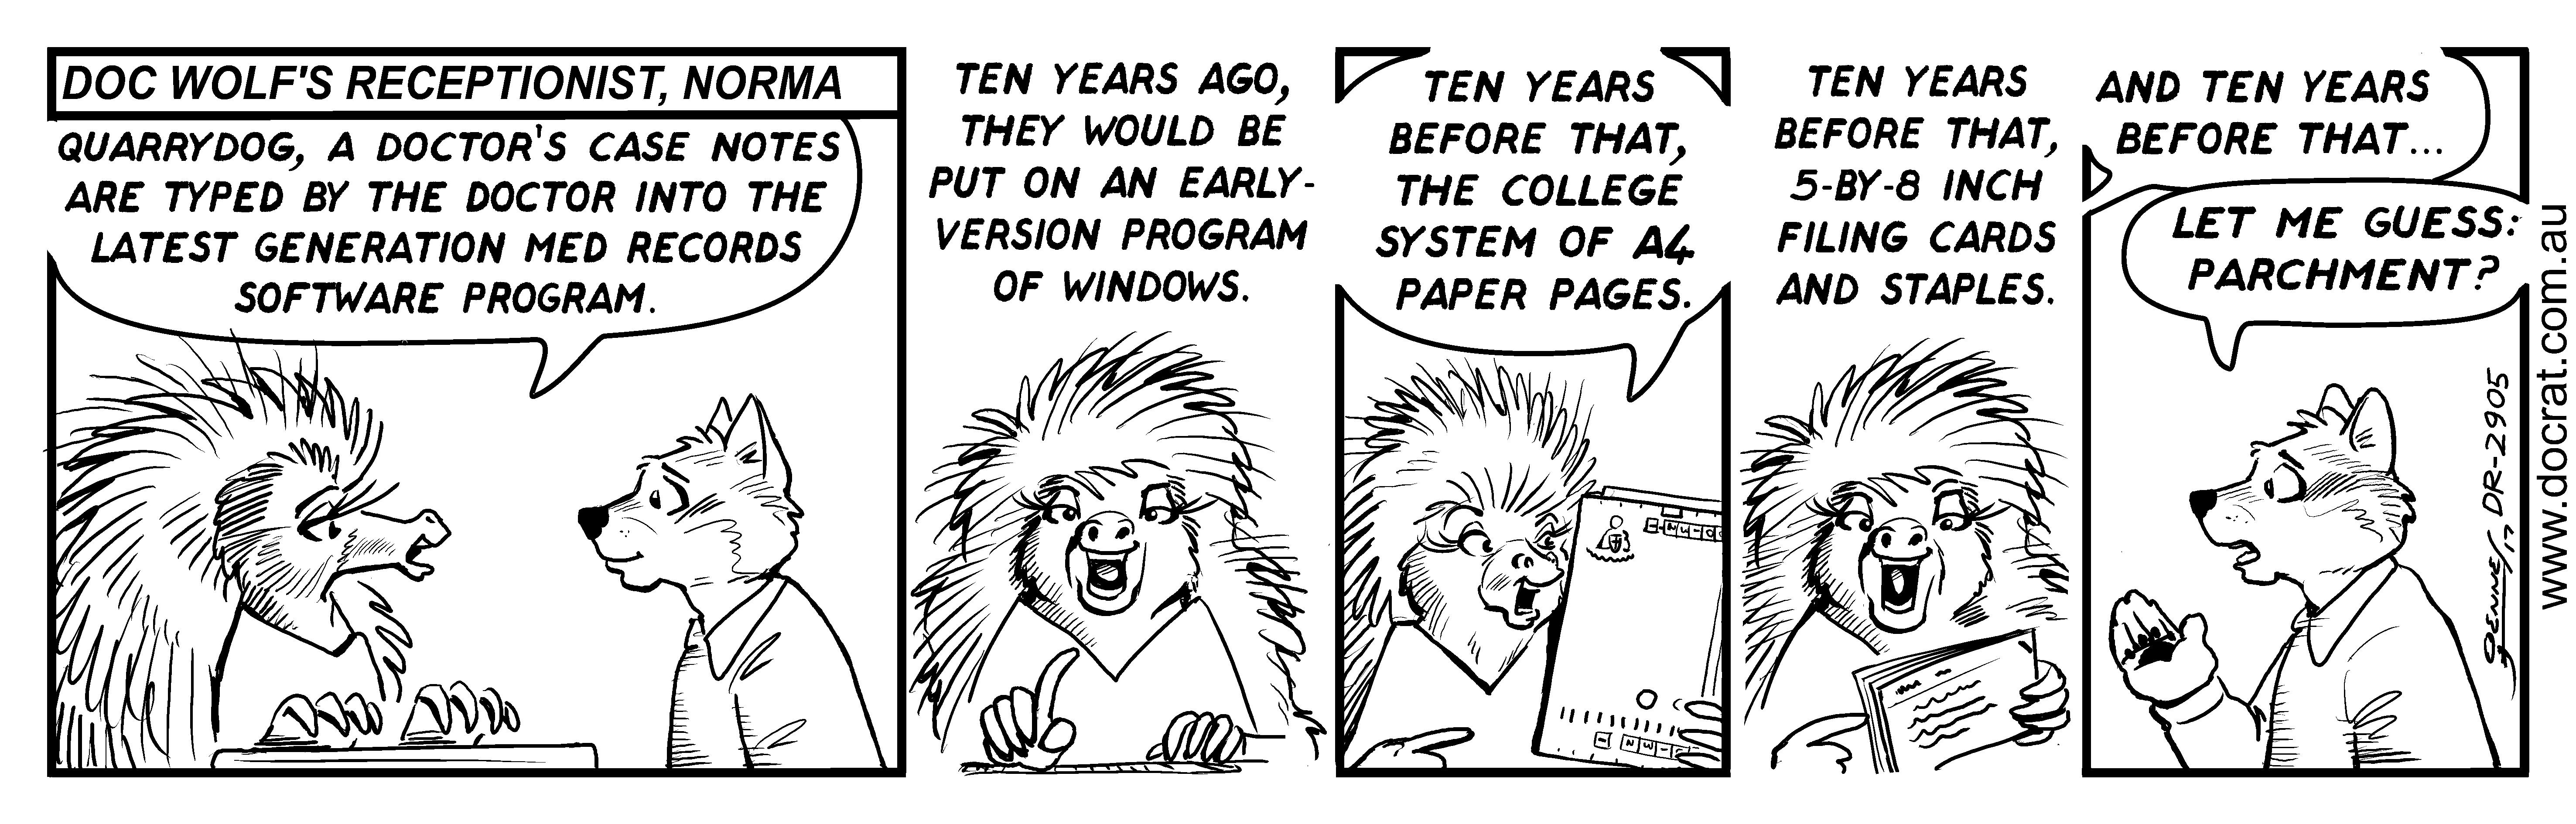 20171110